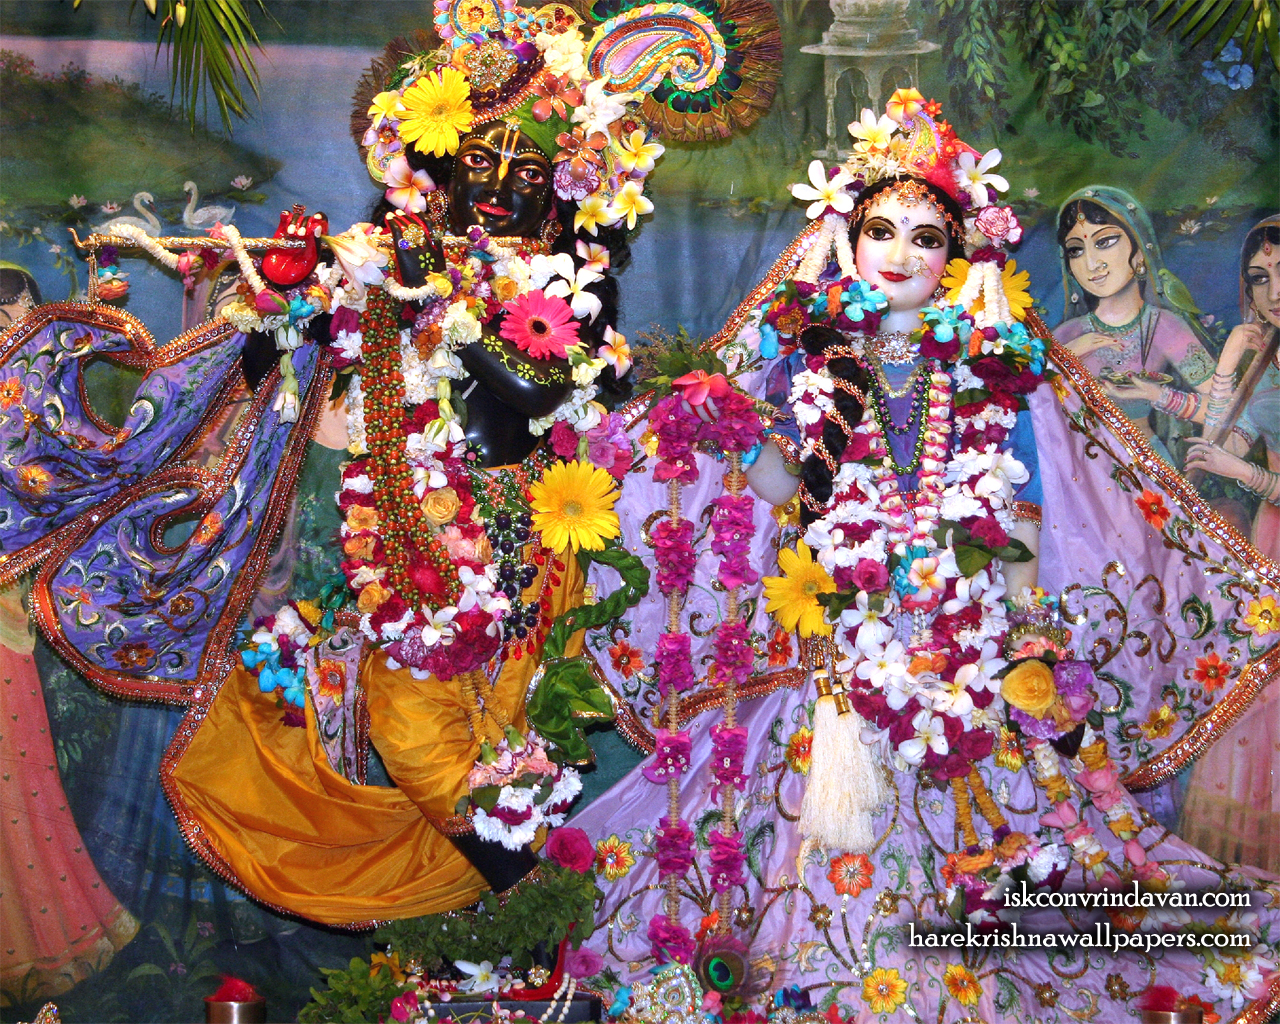 Sri Sri Radha Shyamsundar Wallpaper (014) Size 1280x1024 Download